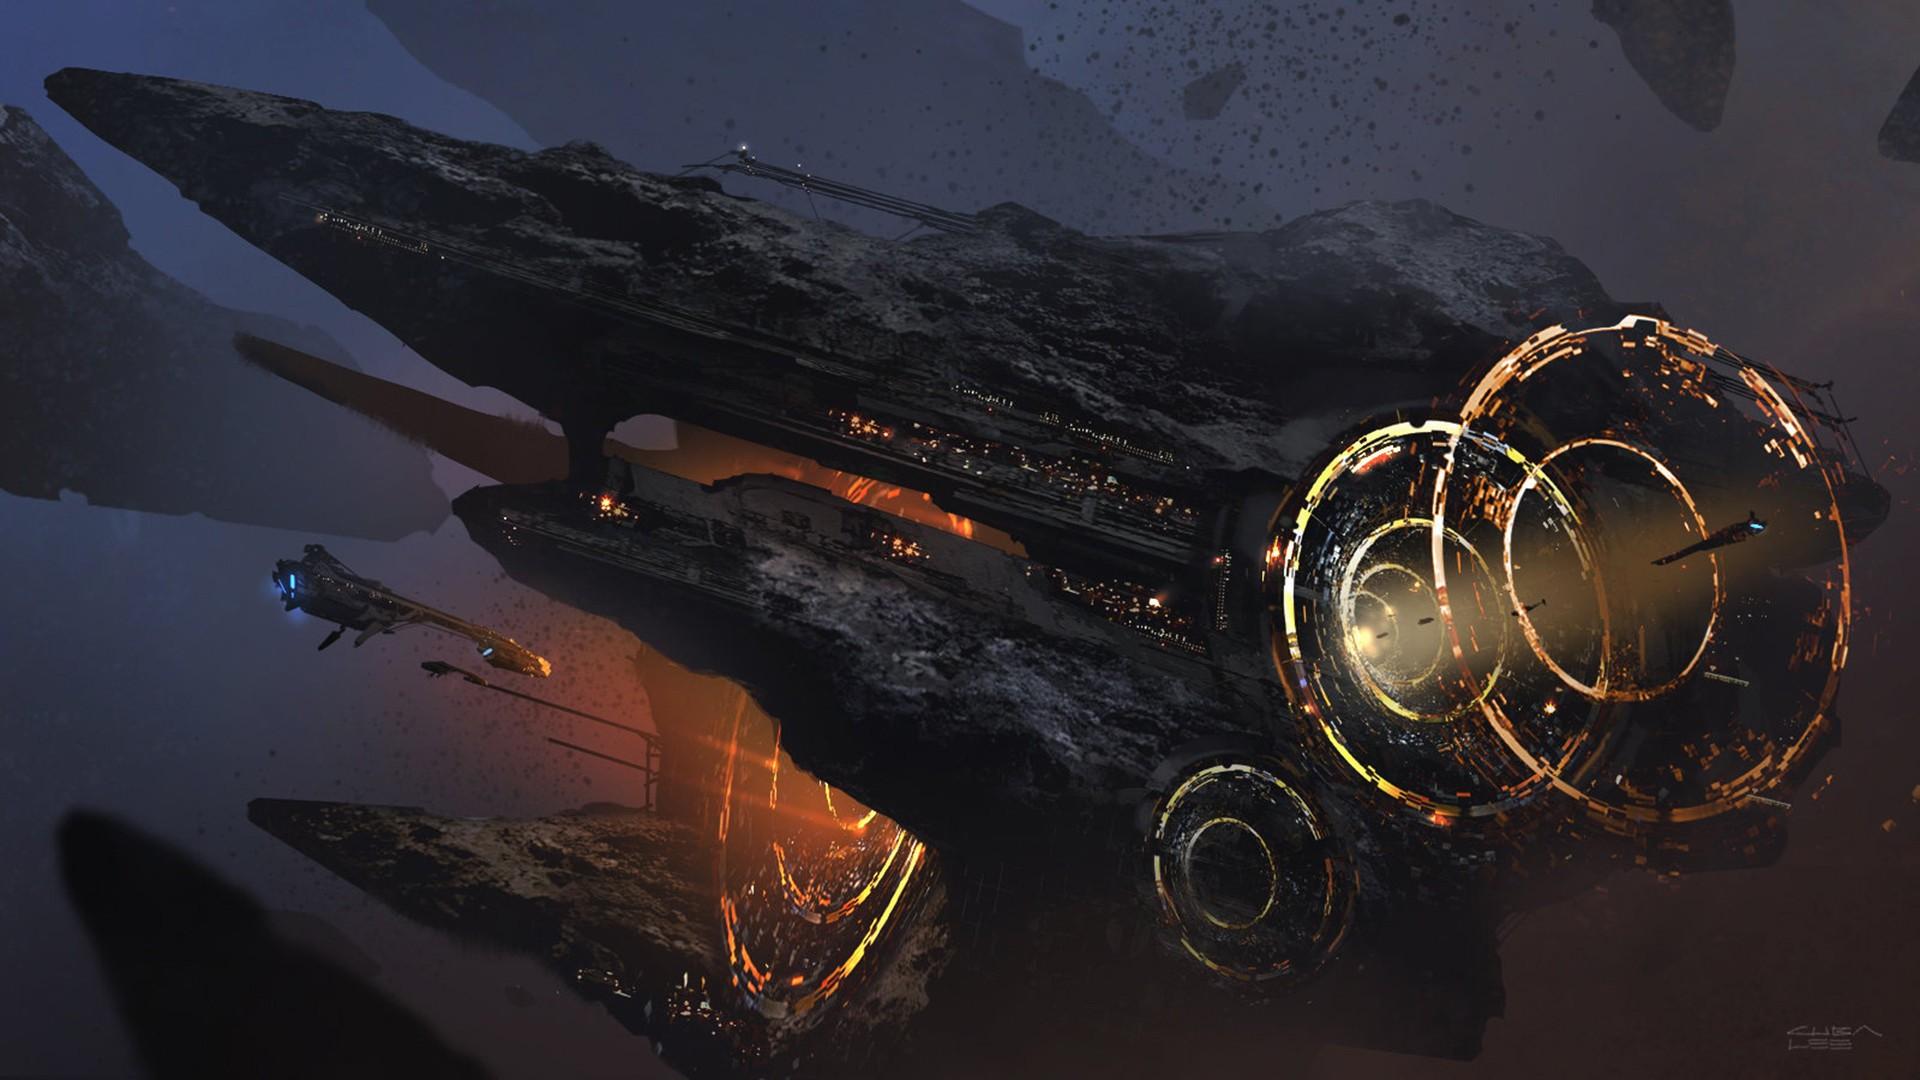 47 Sci Fi wallpapers ·â' Download free stunning full HD